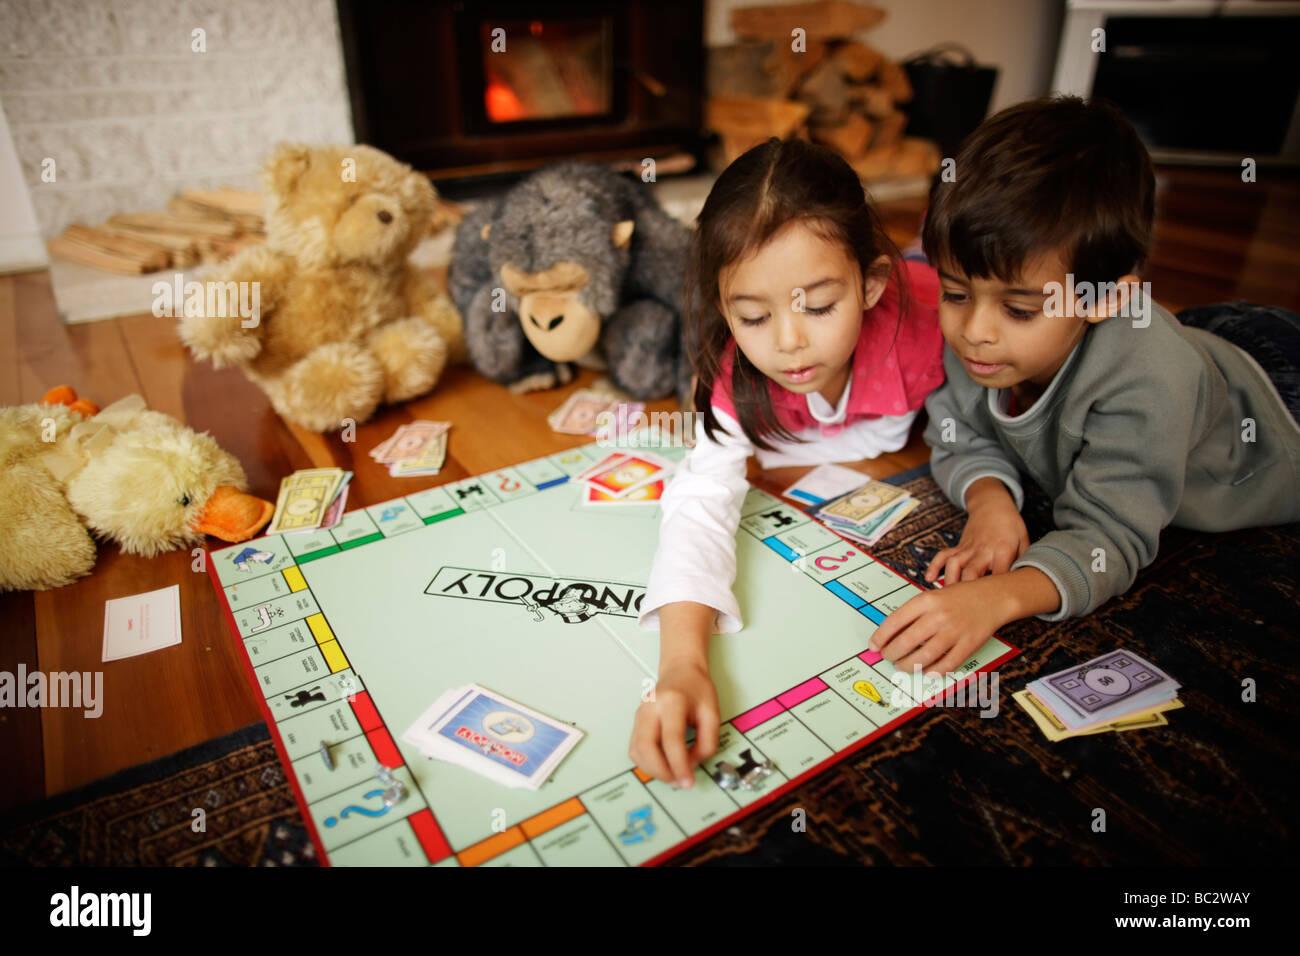 Children play Monopoly - Stock Image